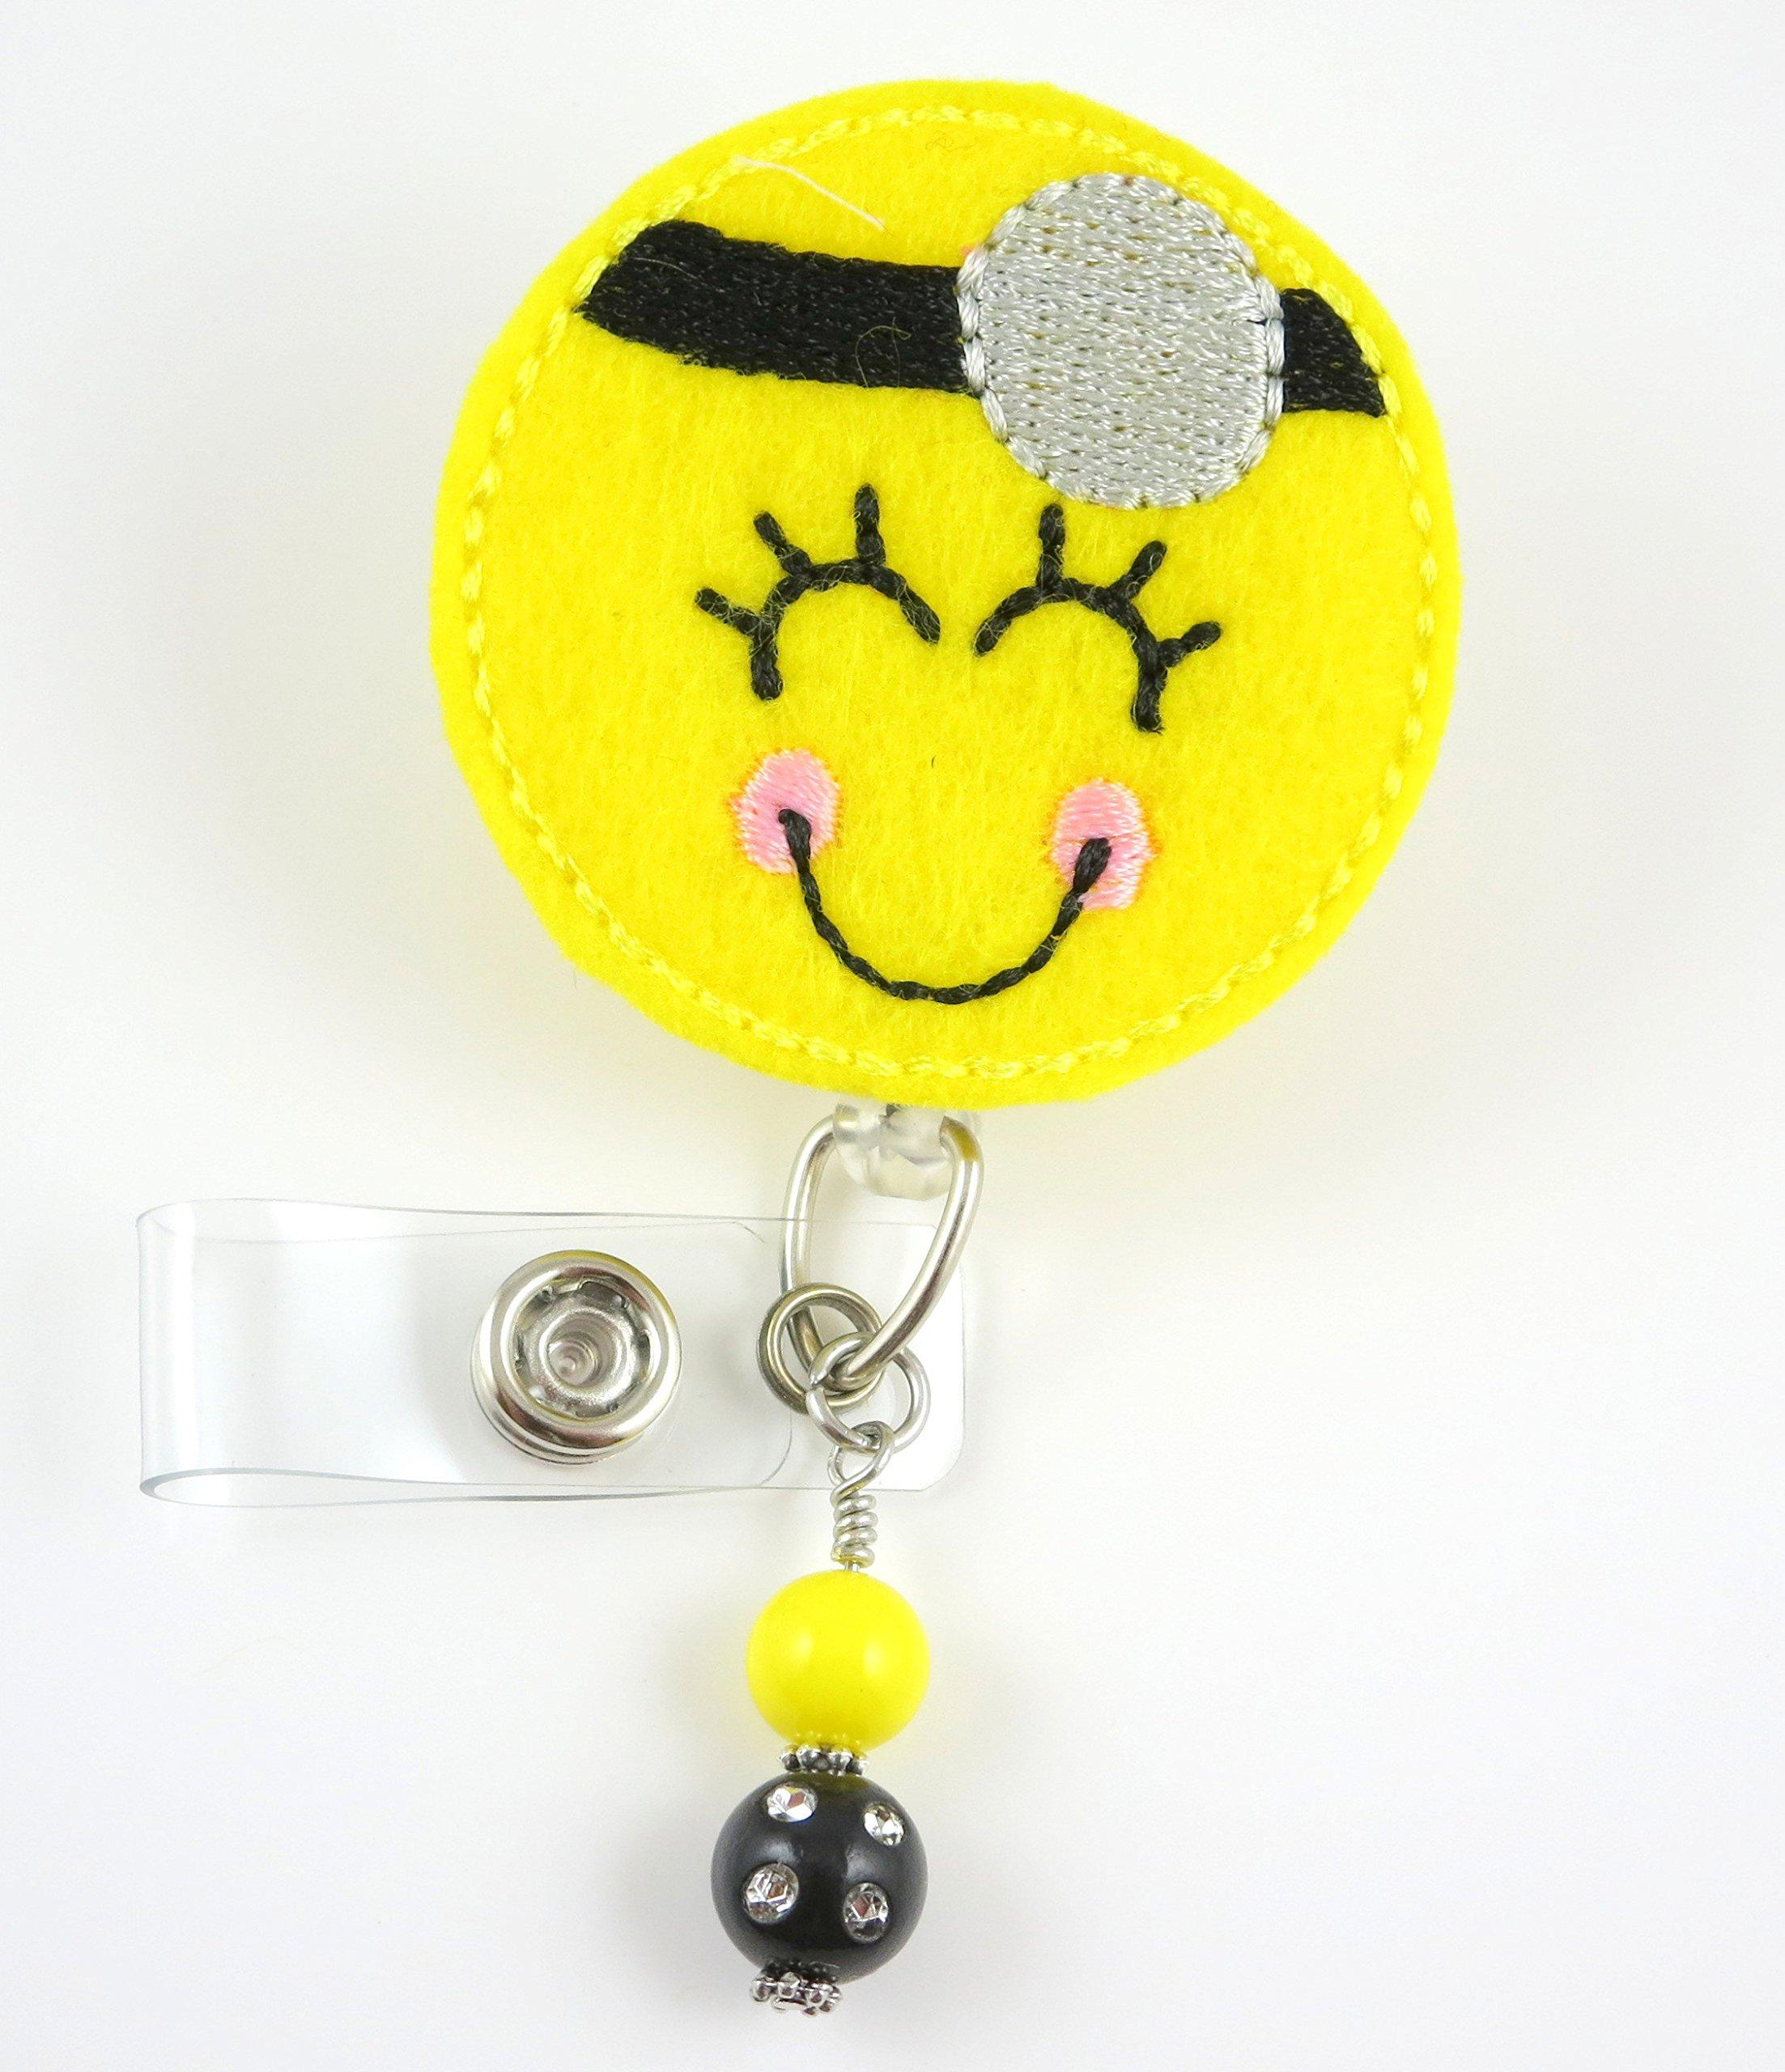 Smiley Doctor - Nurse Badge Reel - Retractable ID Badge Holder - Nurse Badge - Badge Clip - Badge Reels - Pediatric - RN - Name Badge Holder